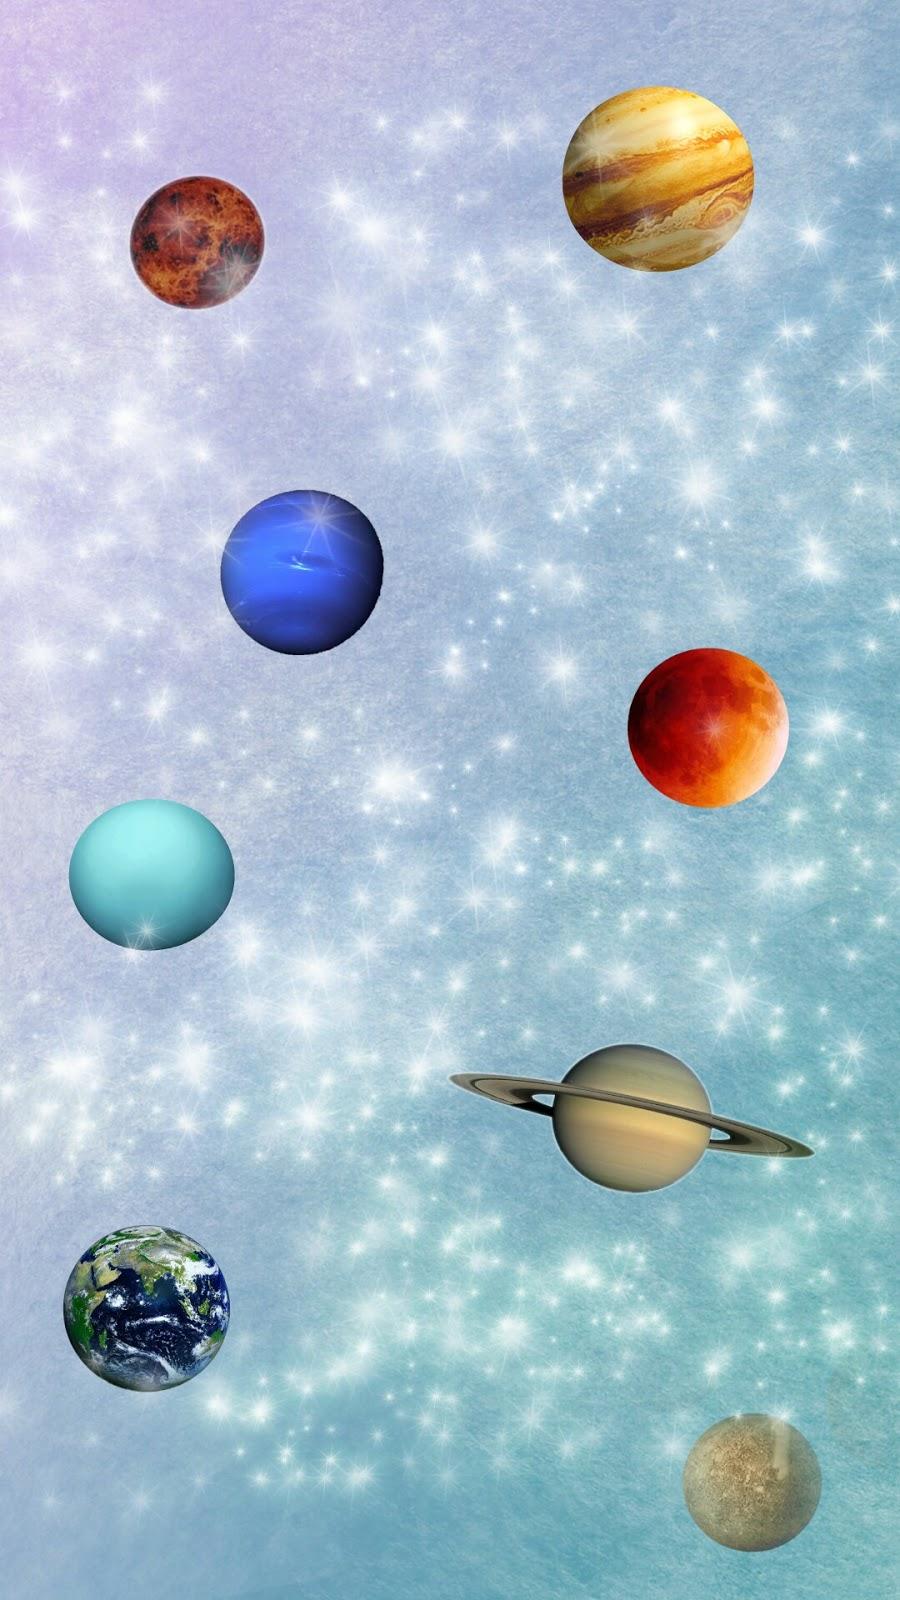 nehru planetarium essay